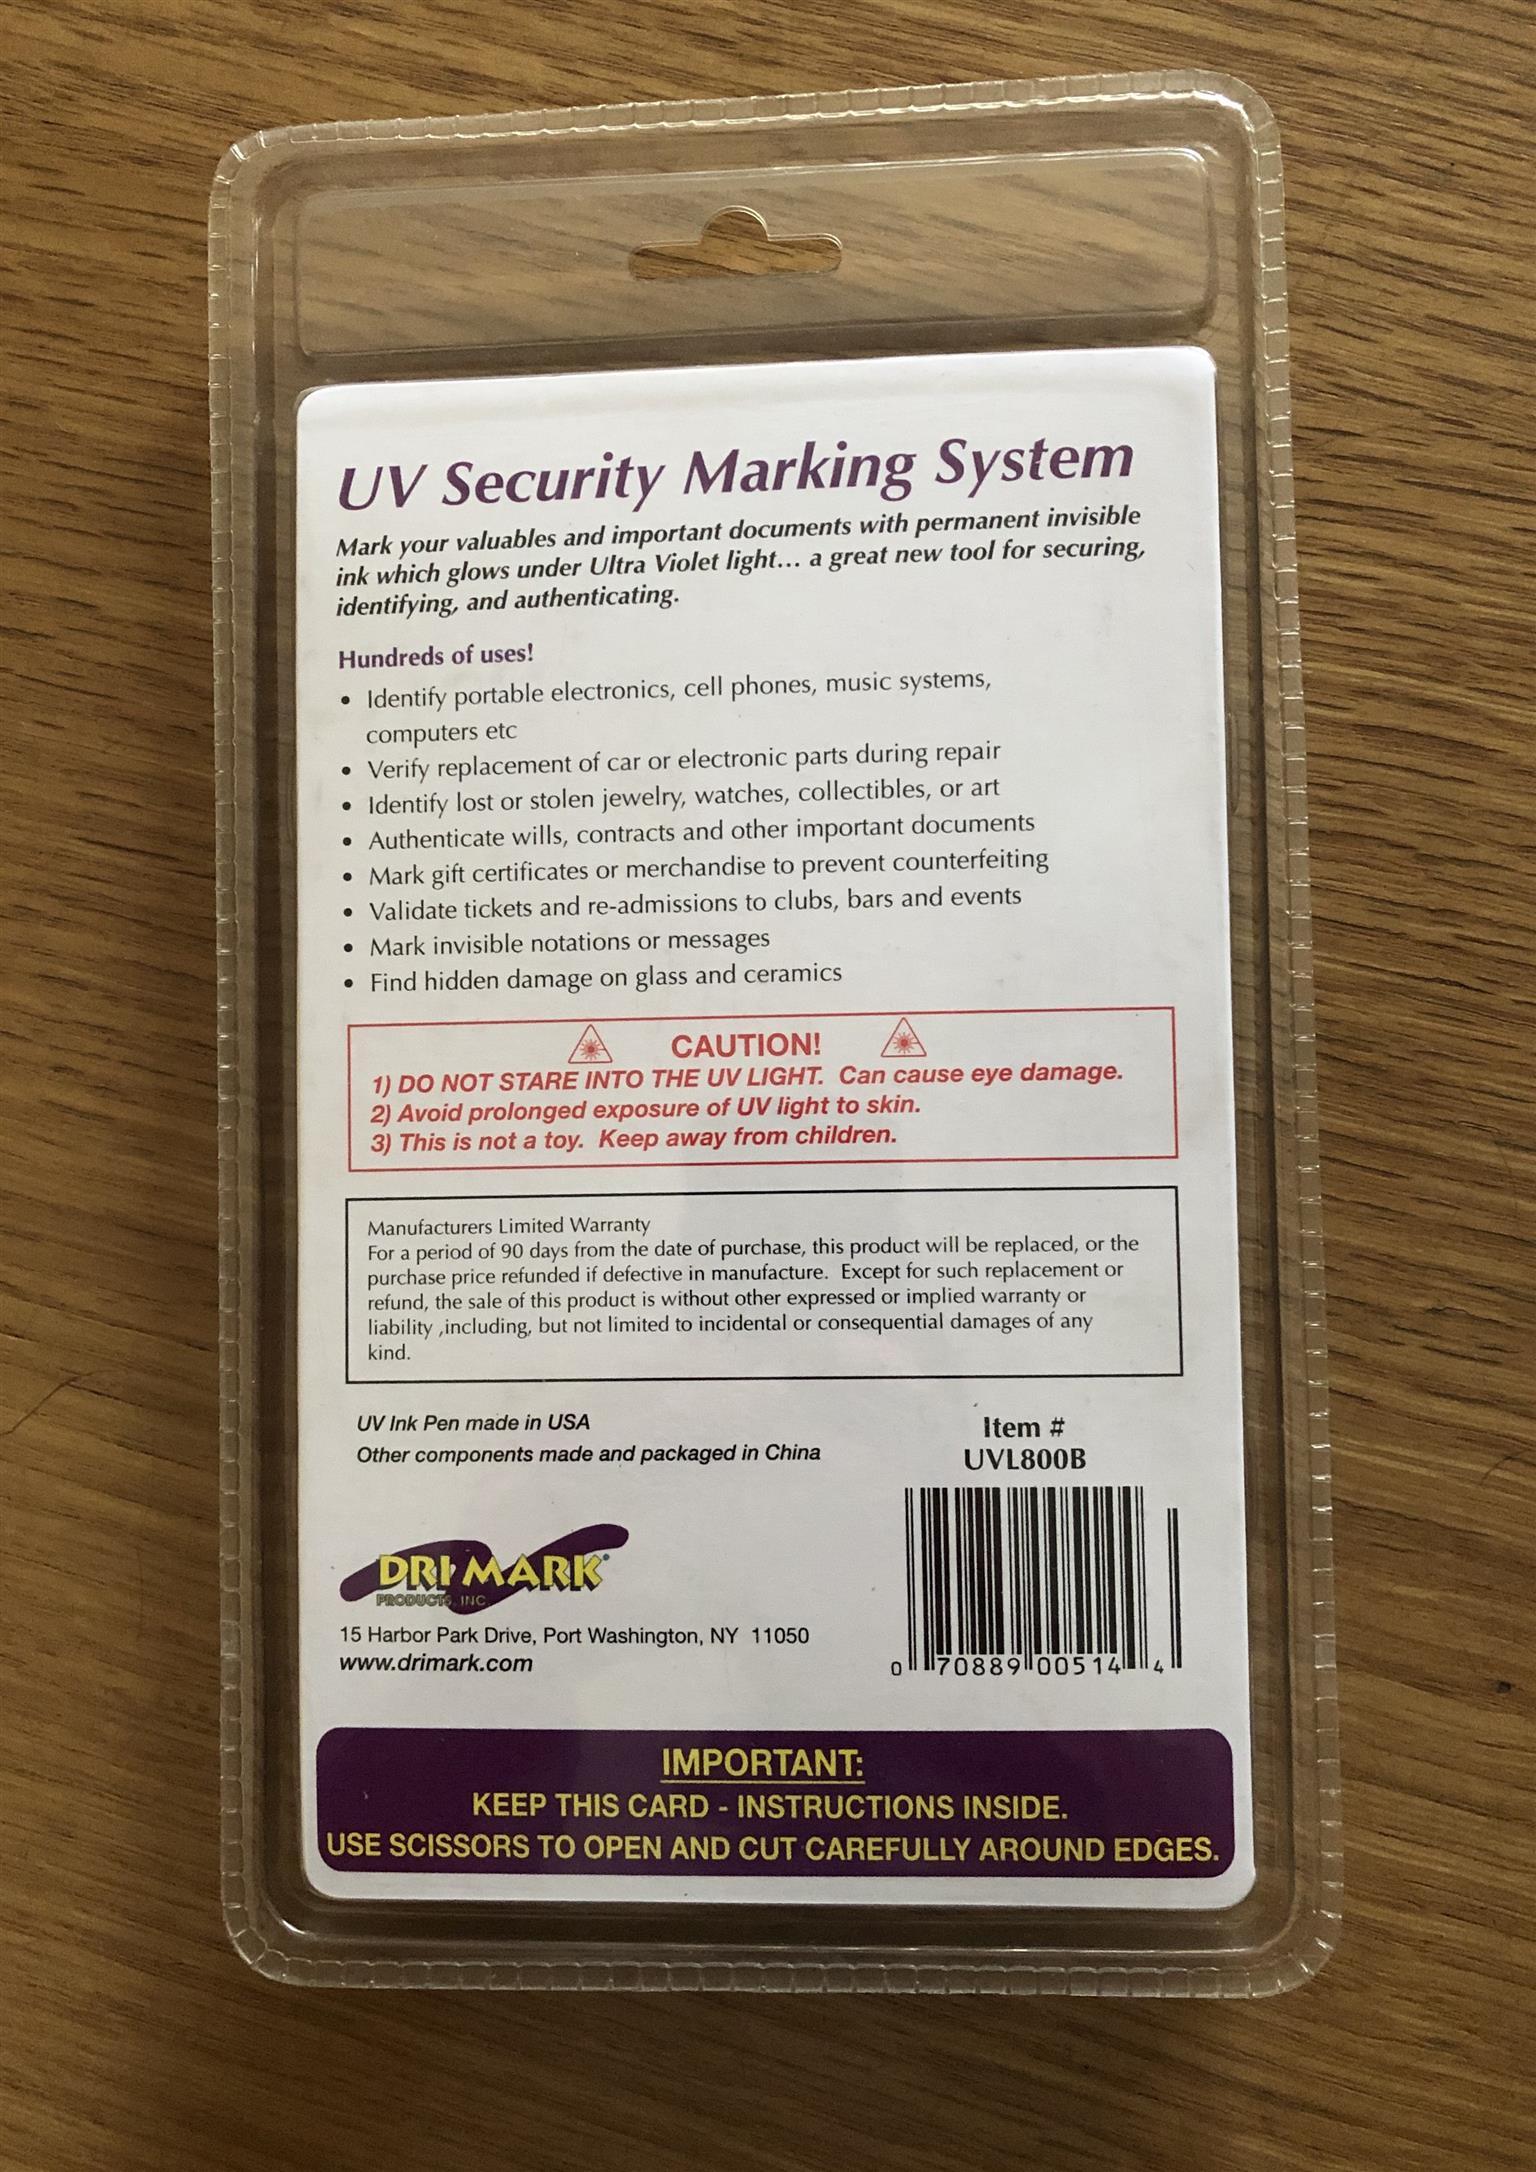 UV security marking system pen